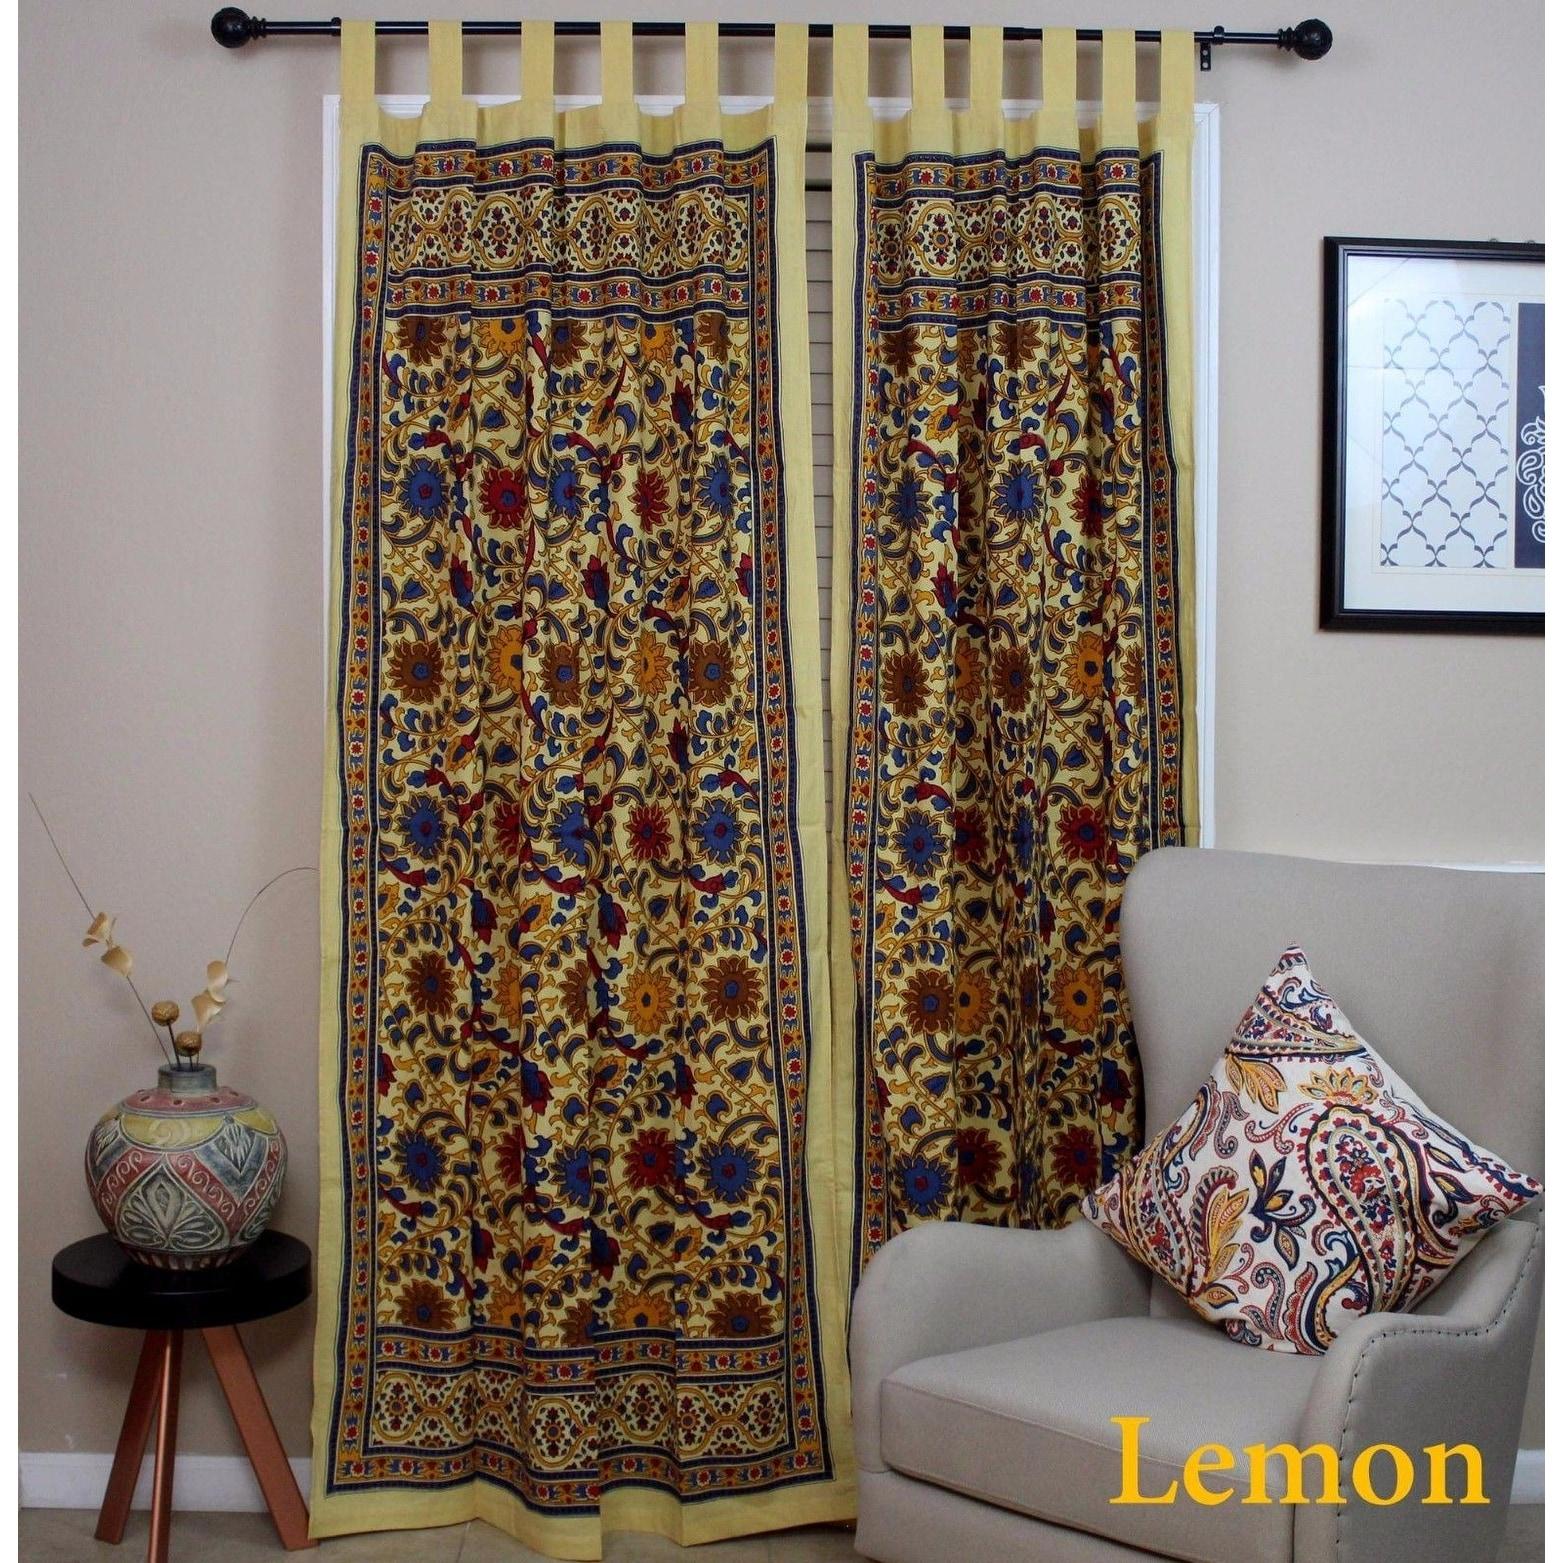 ... Thumbnail Handmade 100% Cotton Sunflower Floral Tab Top Curtain Drape  Door Panel Navy Blue Gray ...